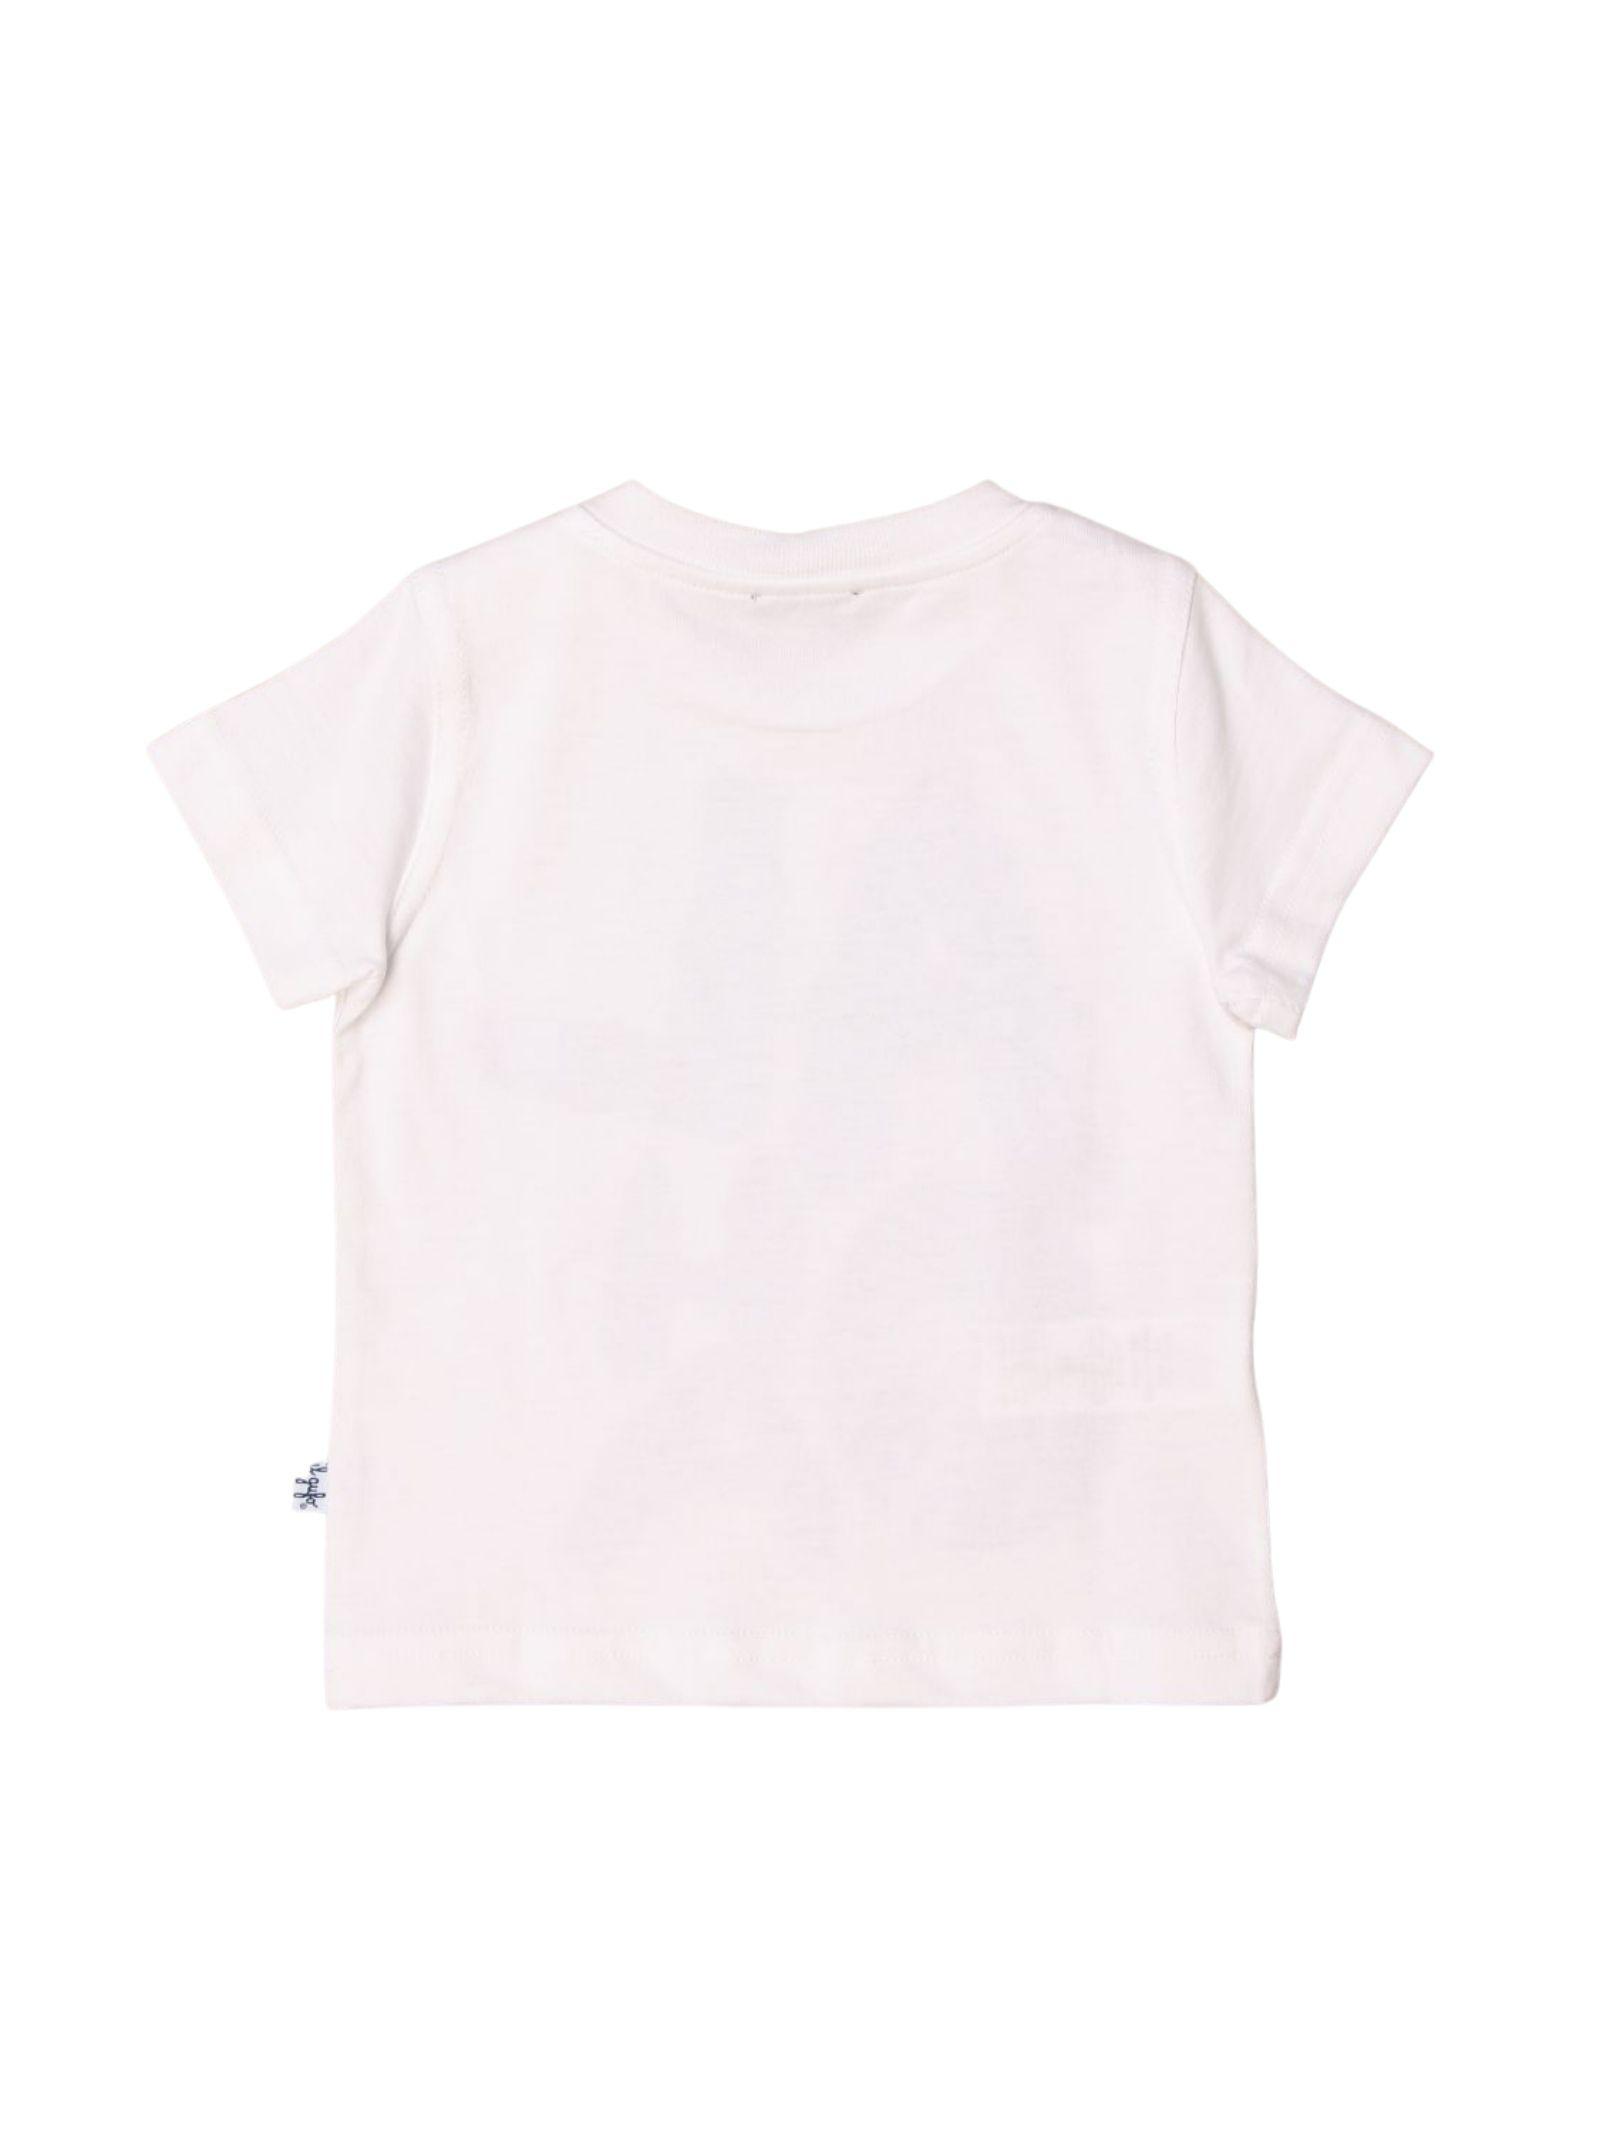 IL GUFO | T-shirt | CP21TS274M00140148